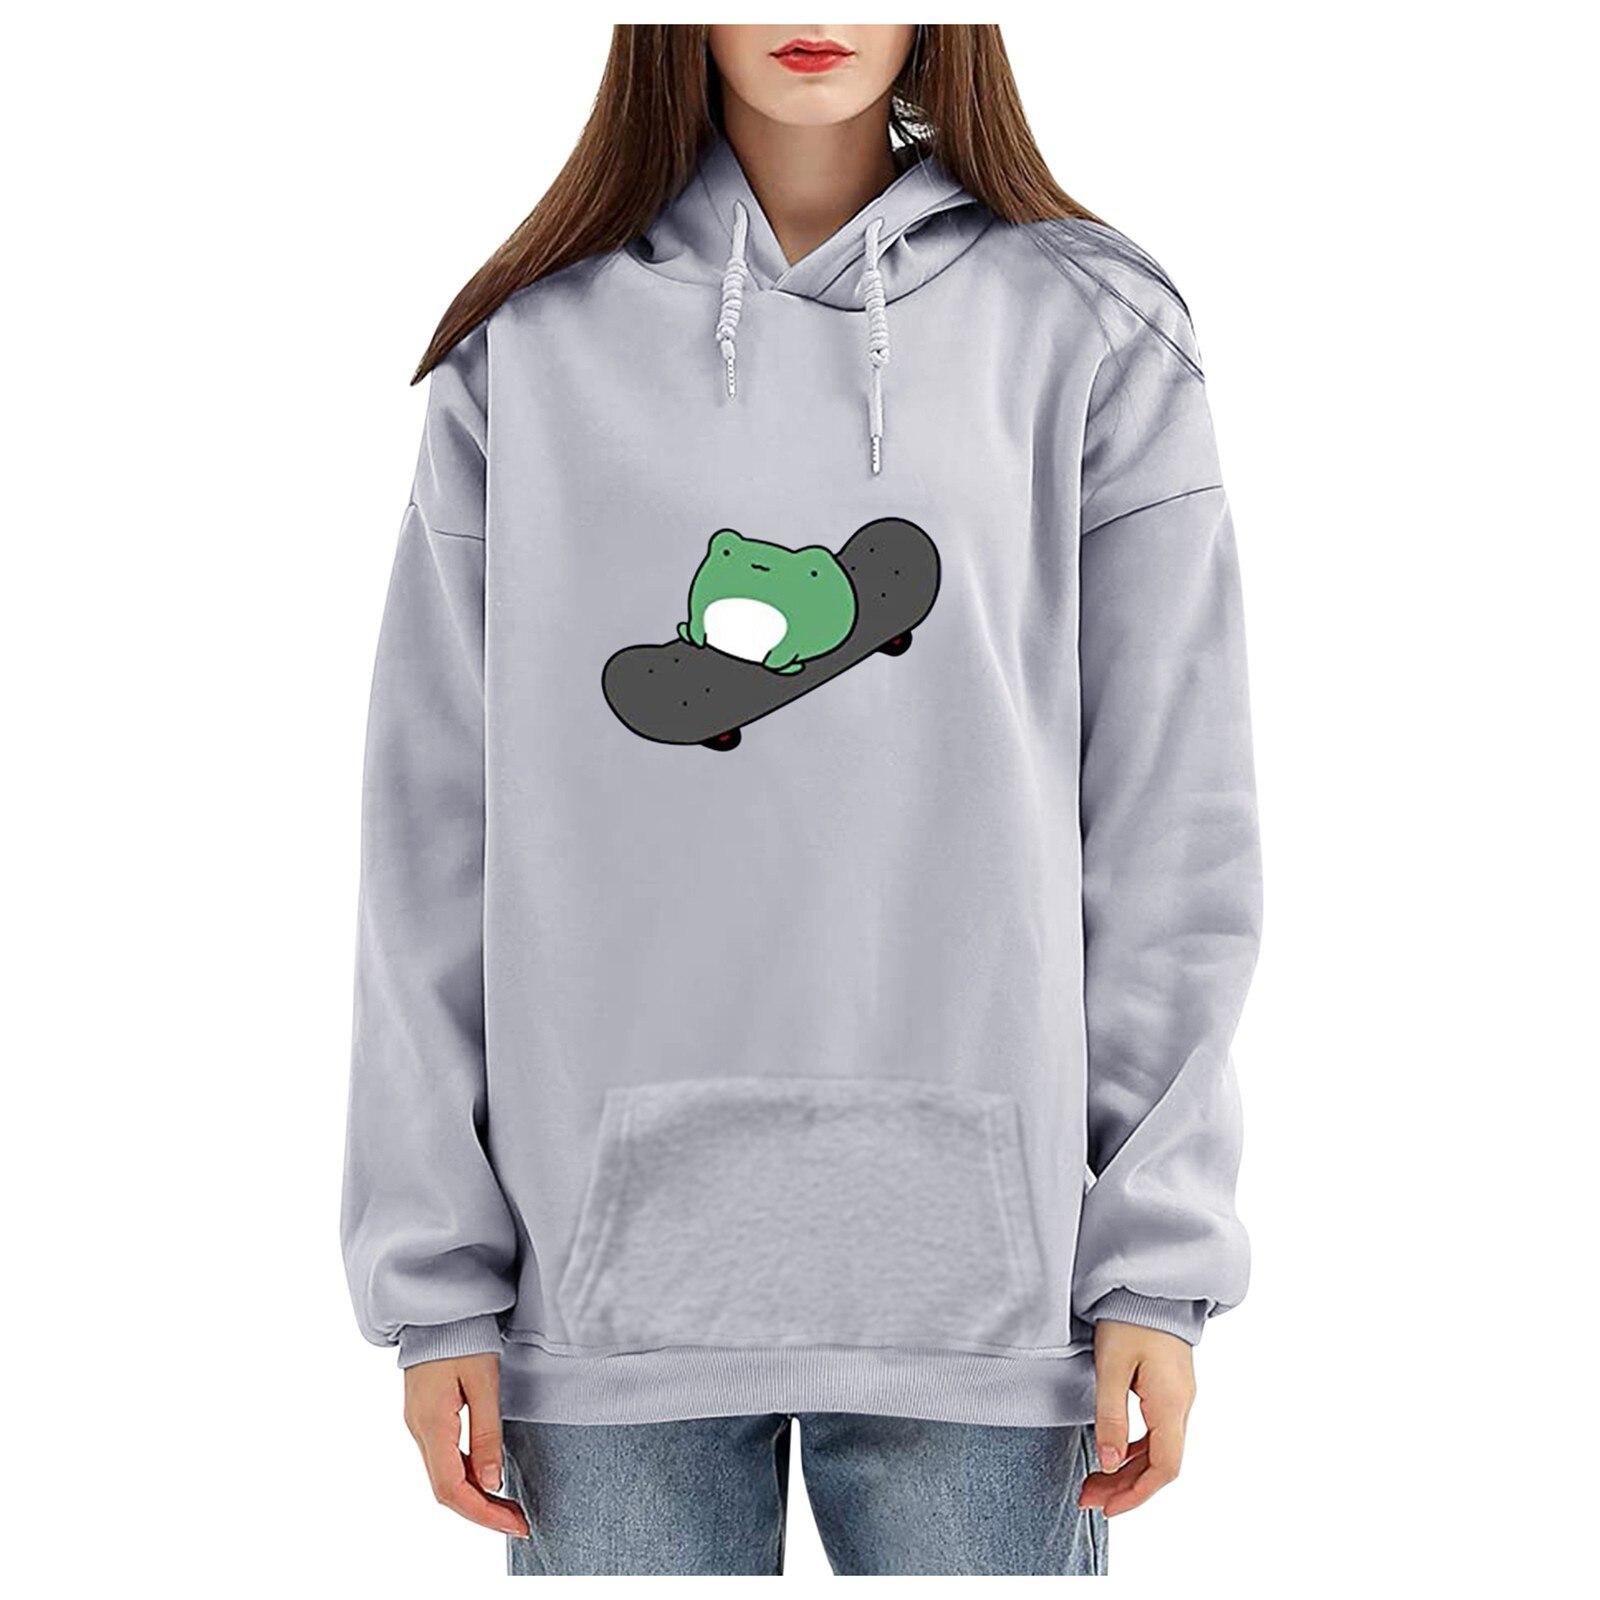 harajuku aesthetic bear anime hoodie women korean kawaii crewneck long sleeve oversized fall winter clothes kpop streetwear tops 19